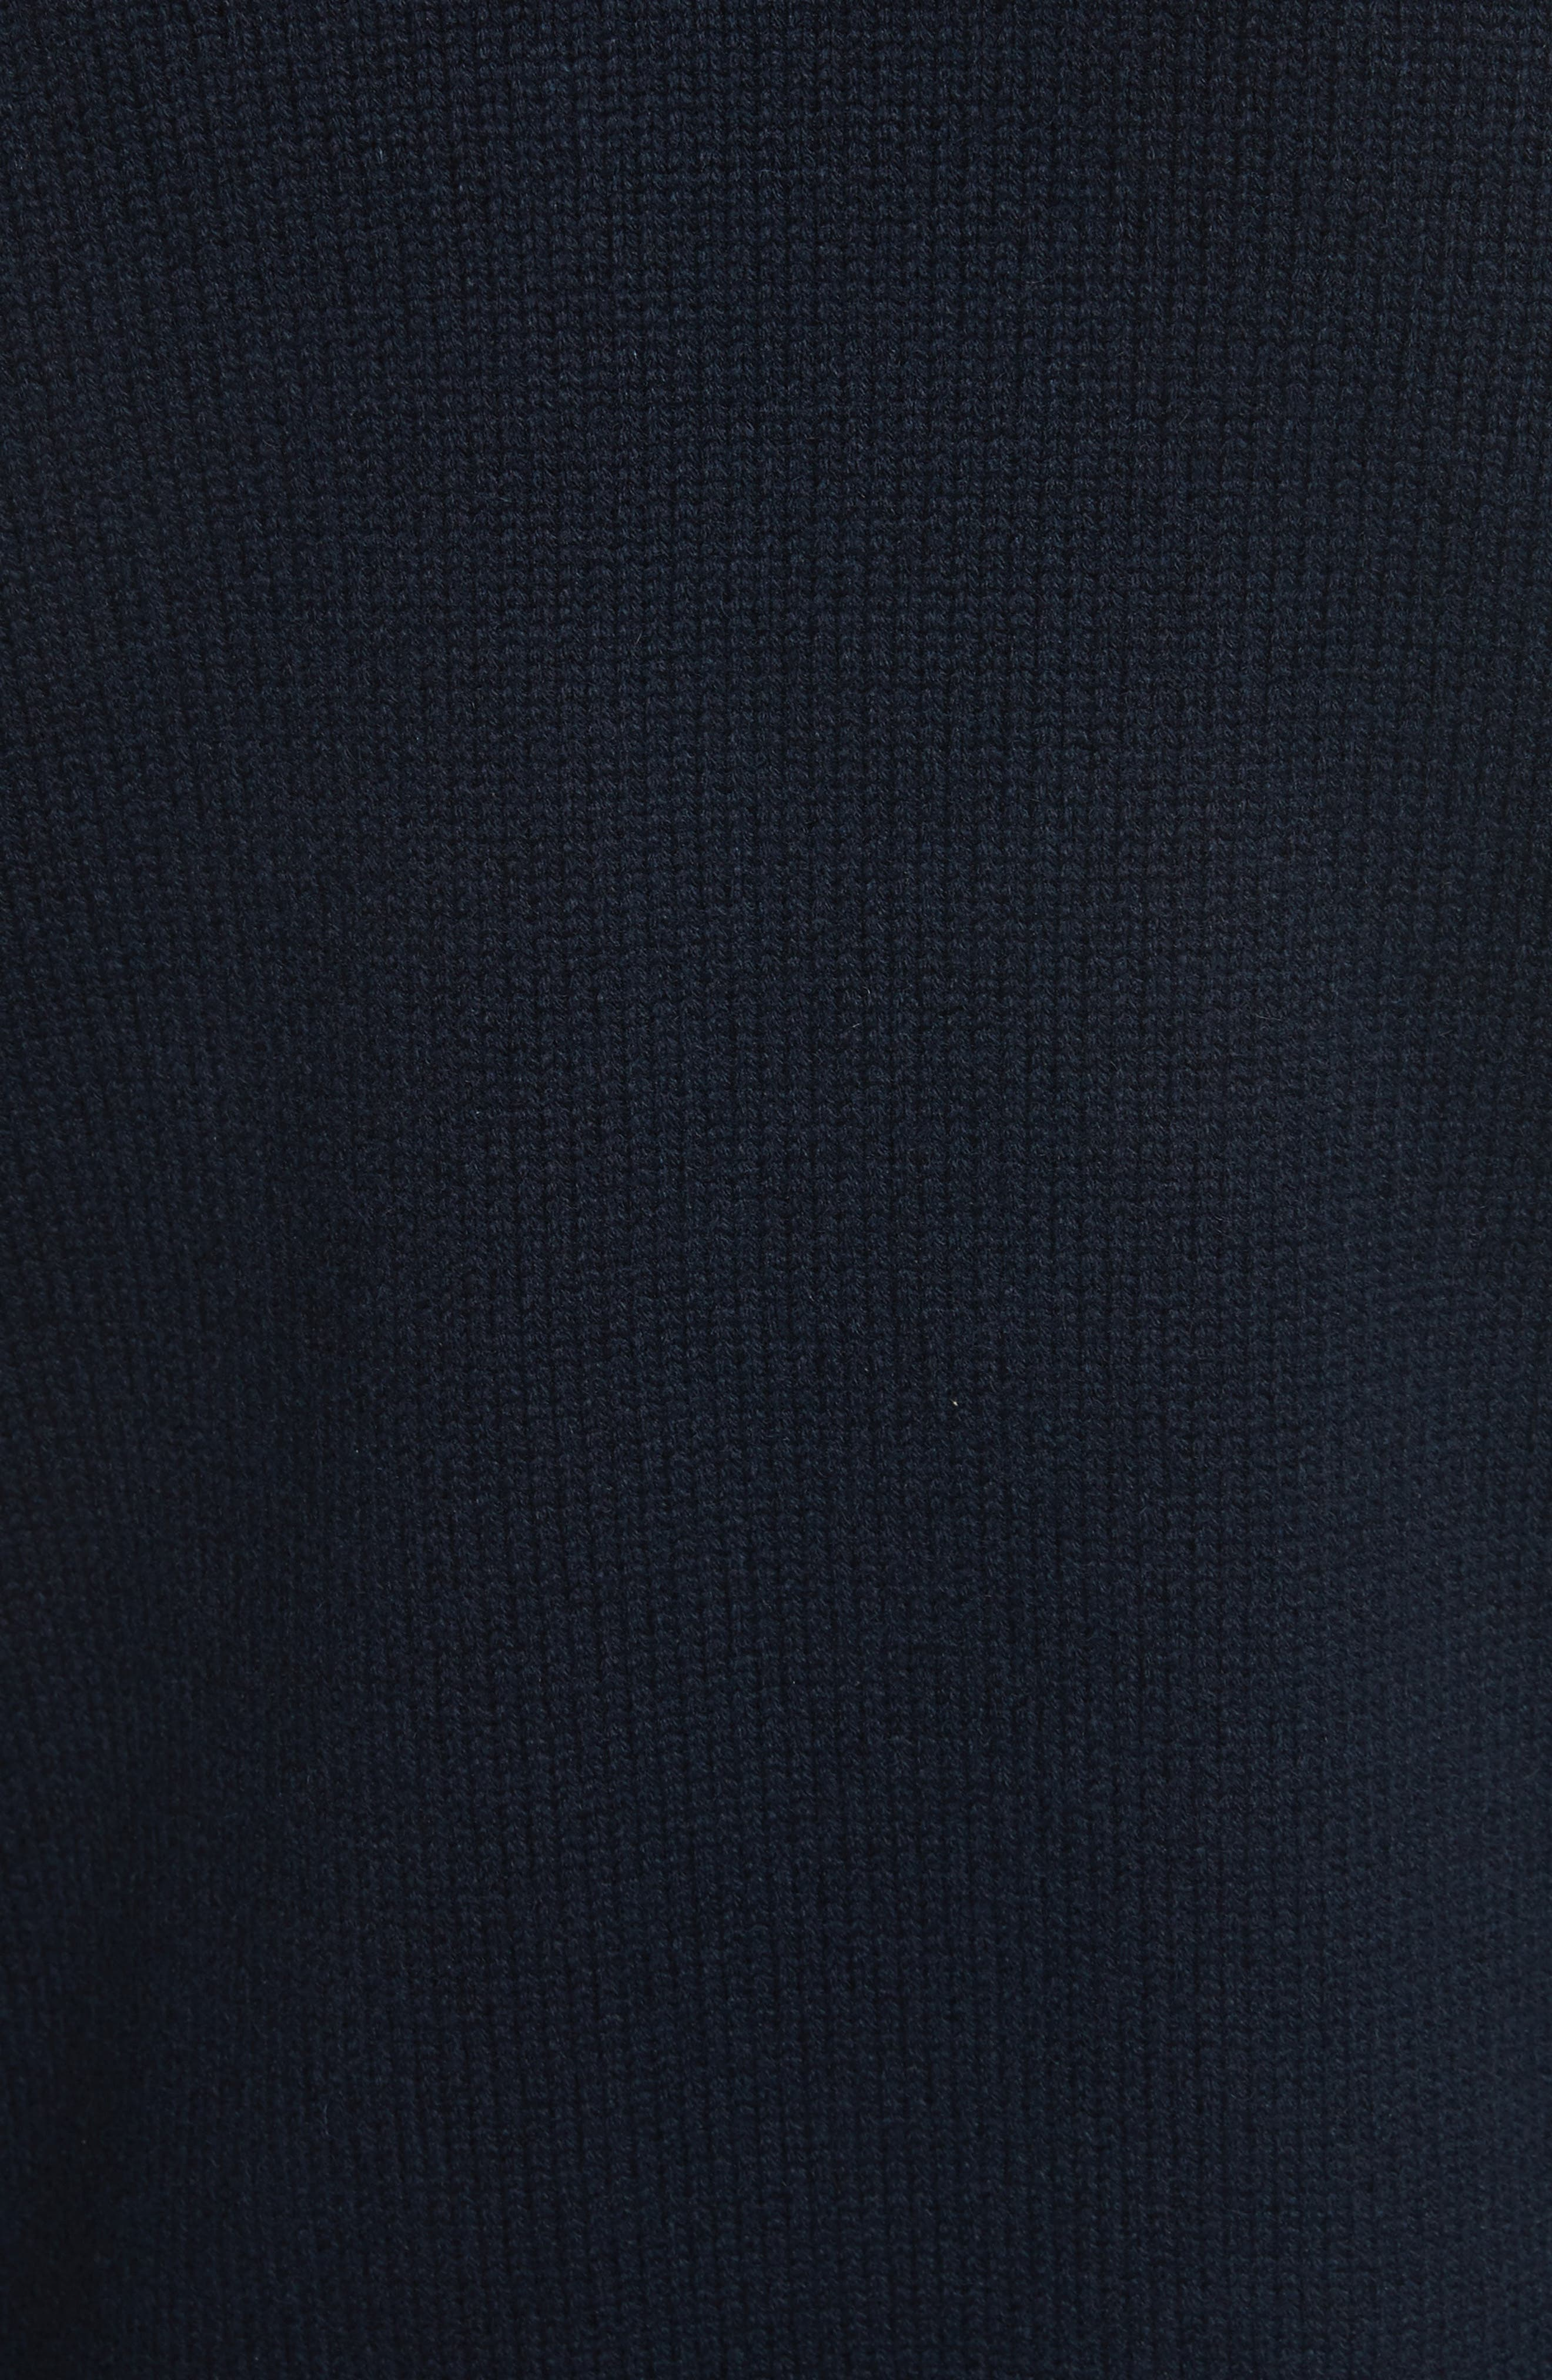 Quilted Velvet & Knit Cardigan,                             Alternate thumbnail 6, color,